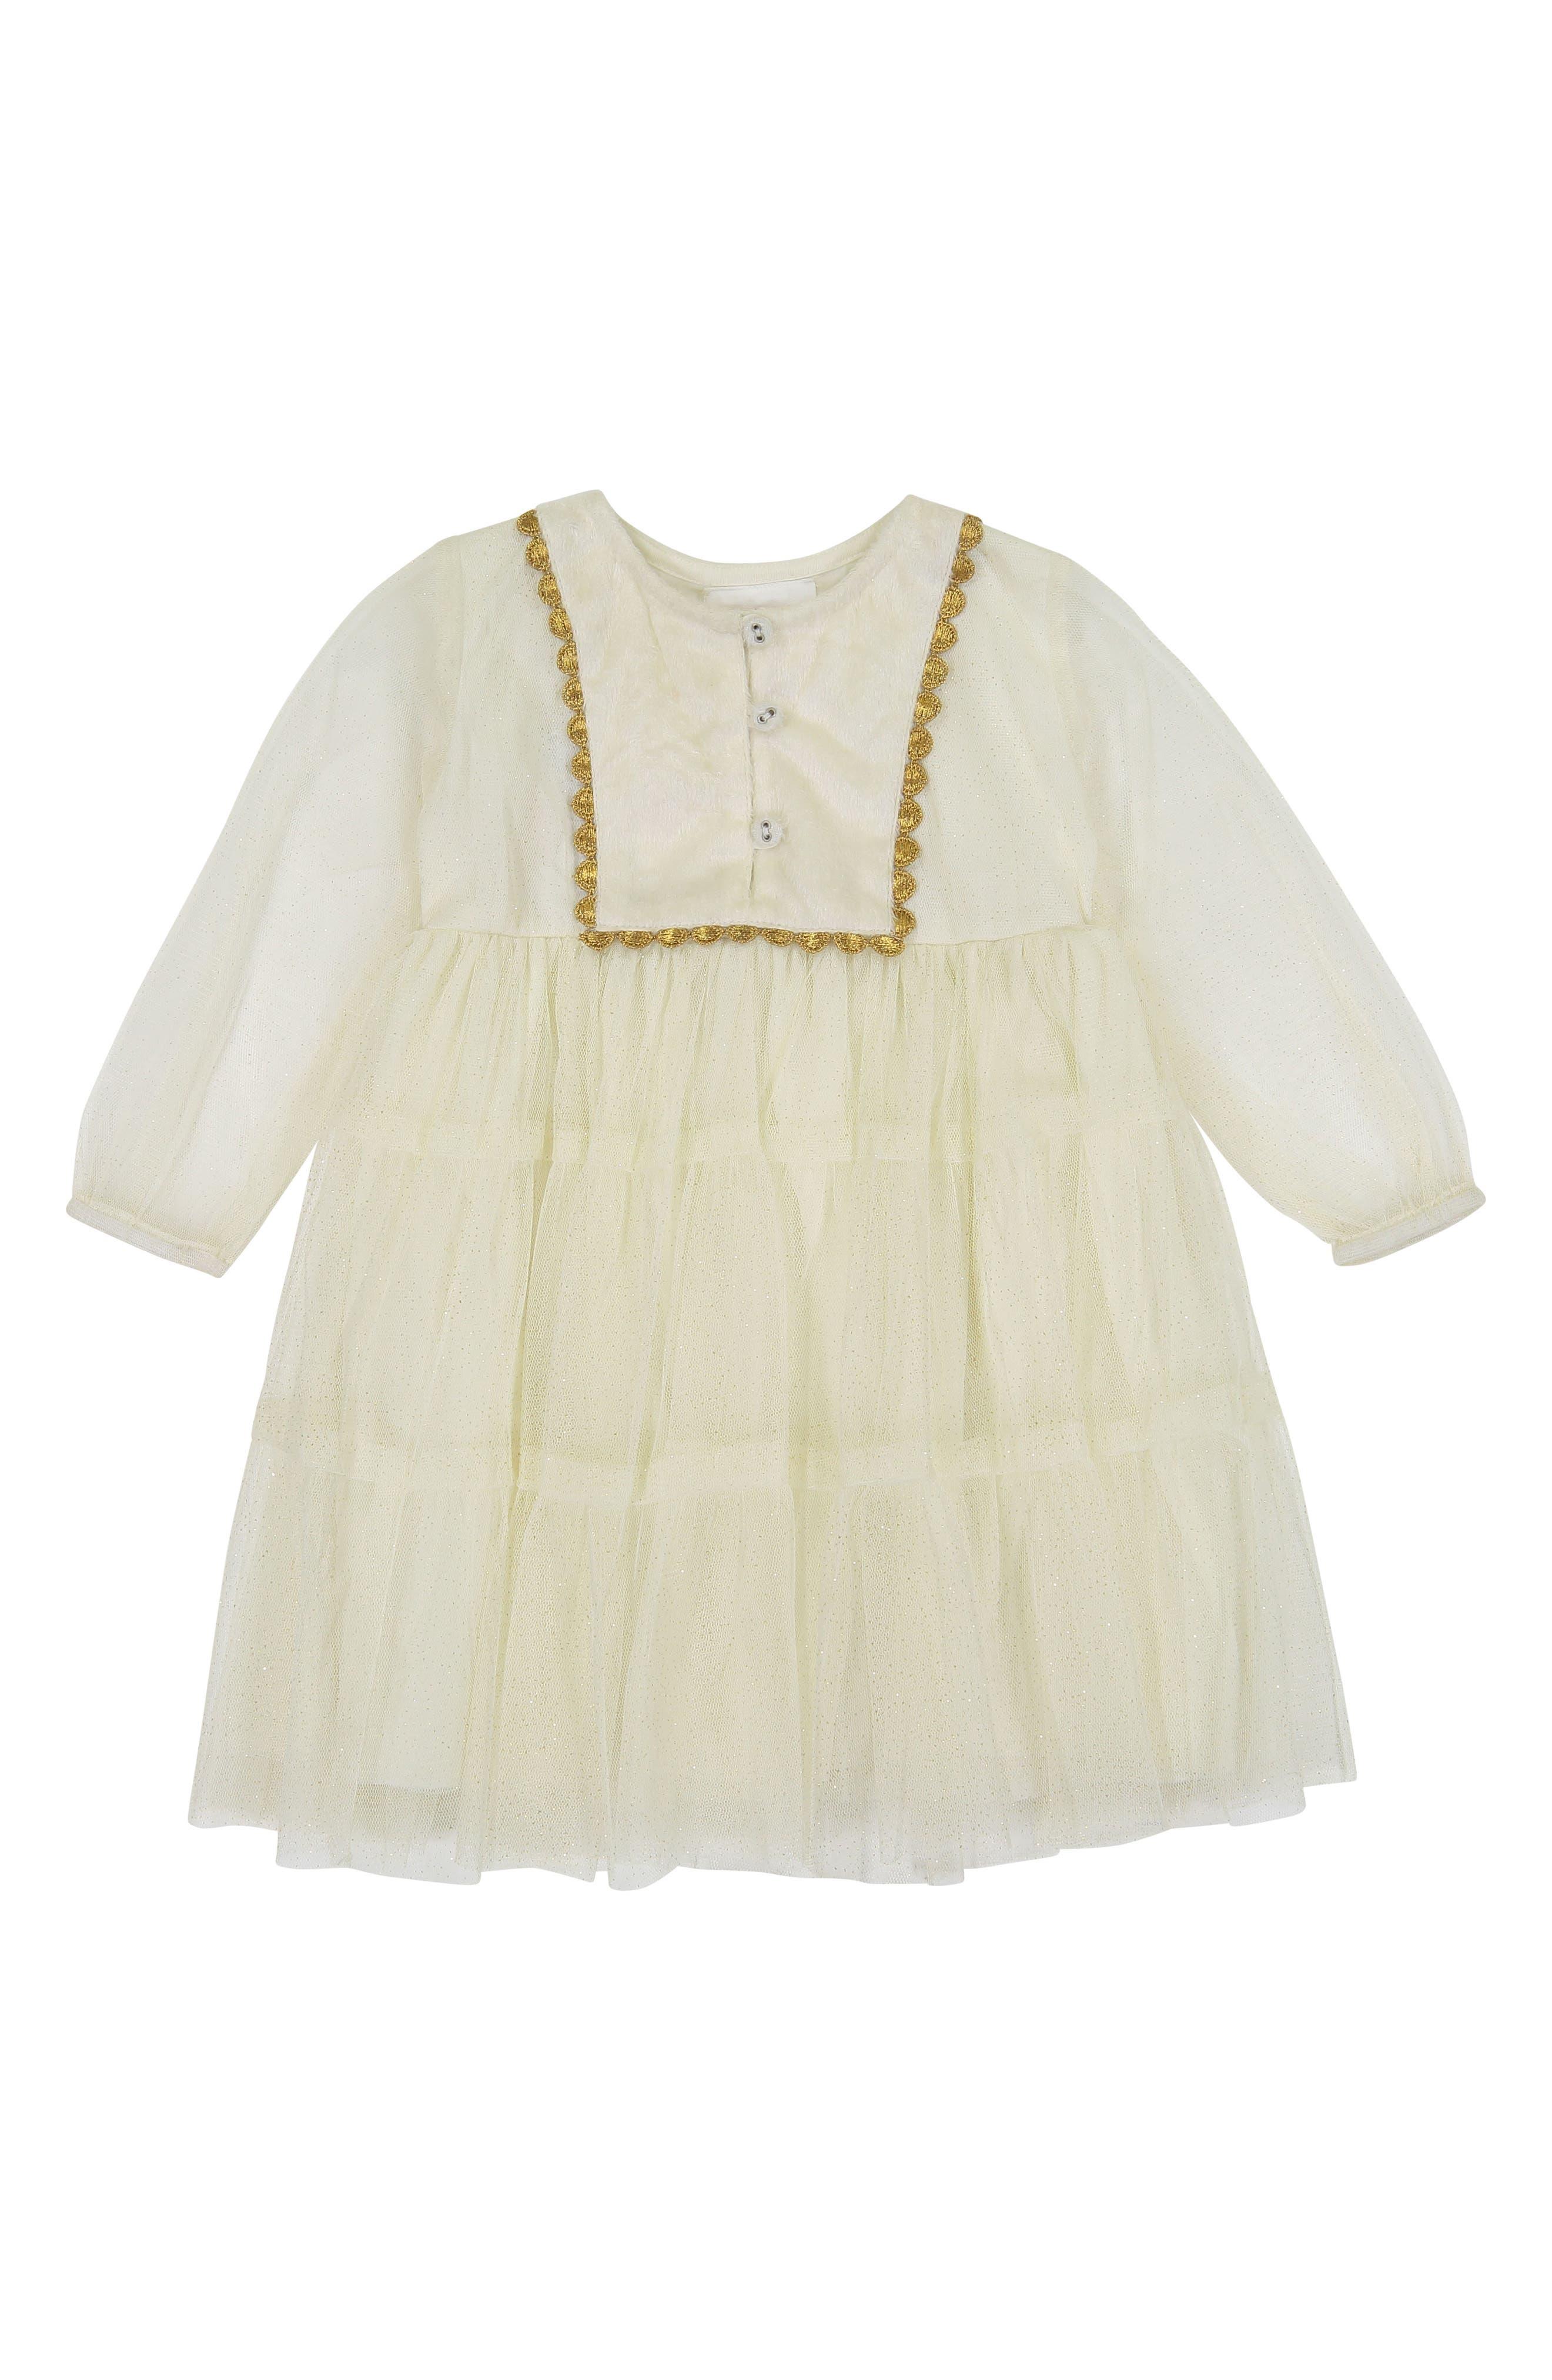 MASALA BABY Metallic Dress, Main, color, 900